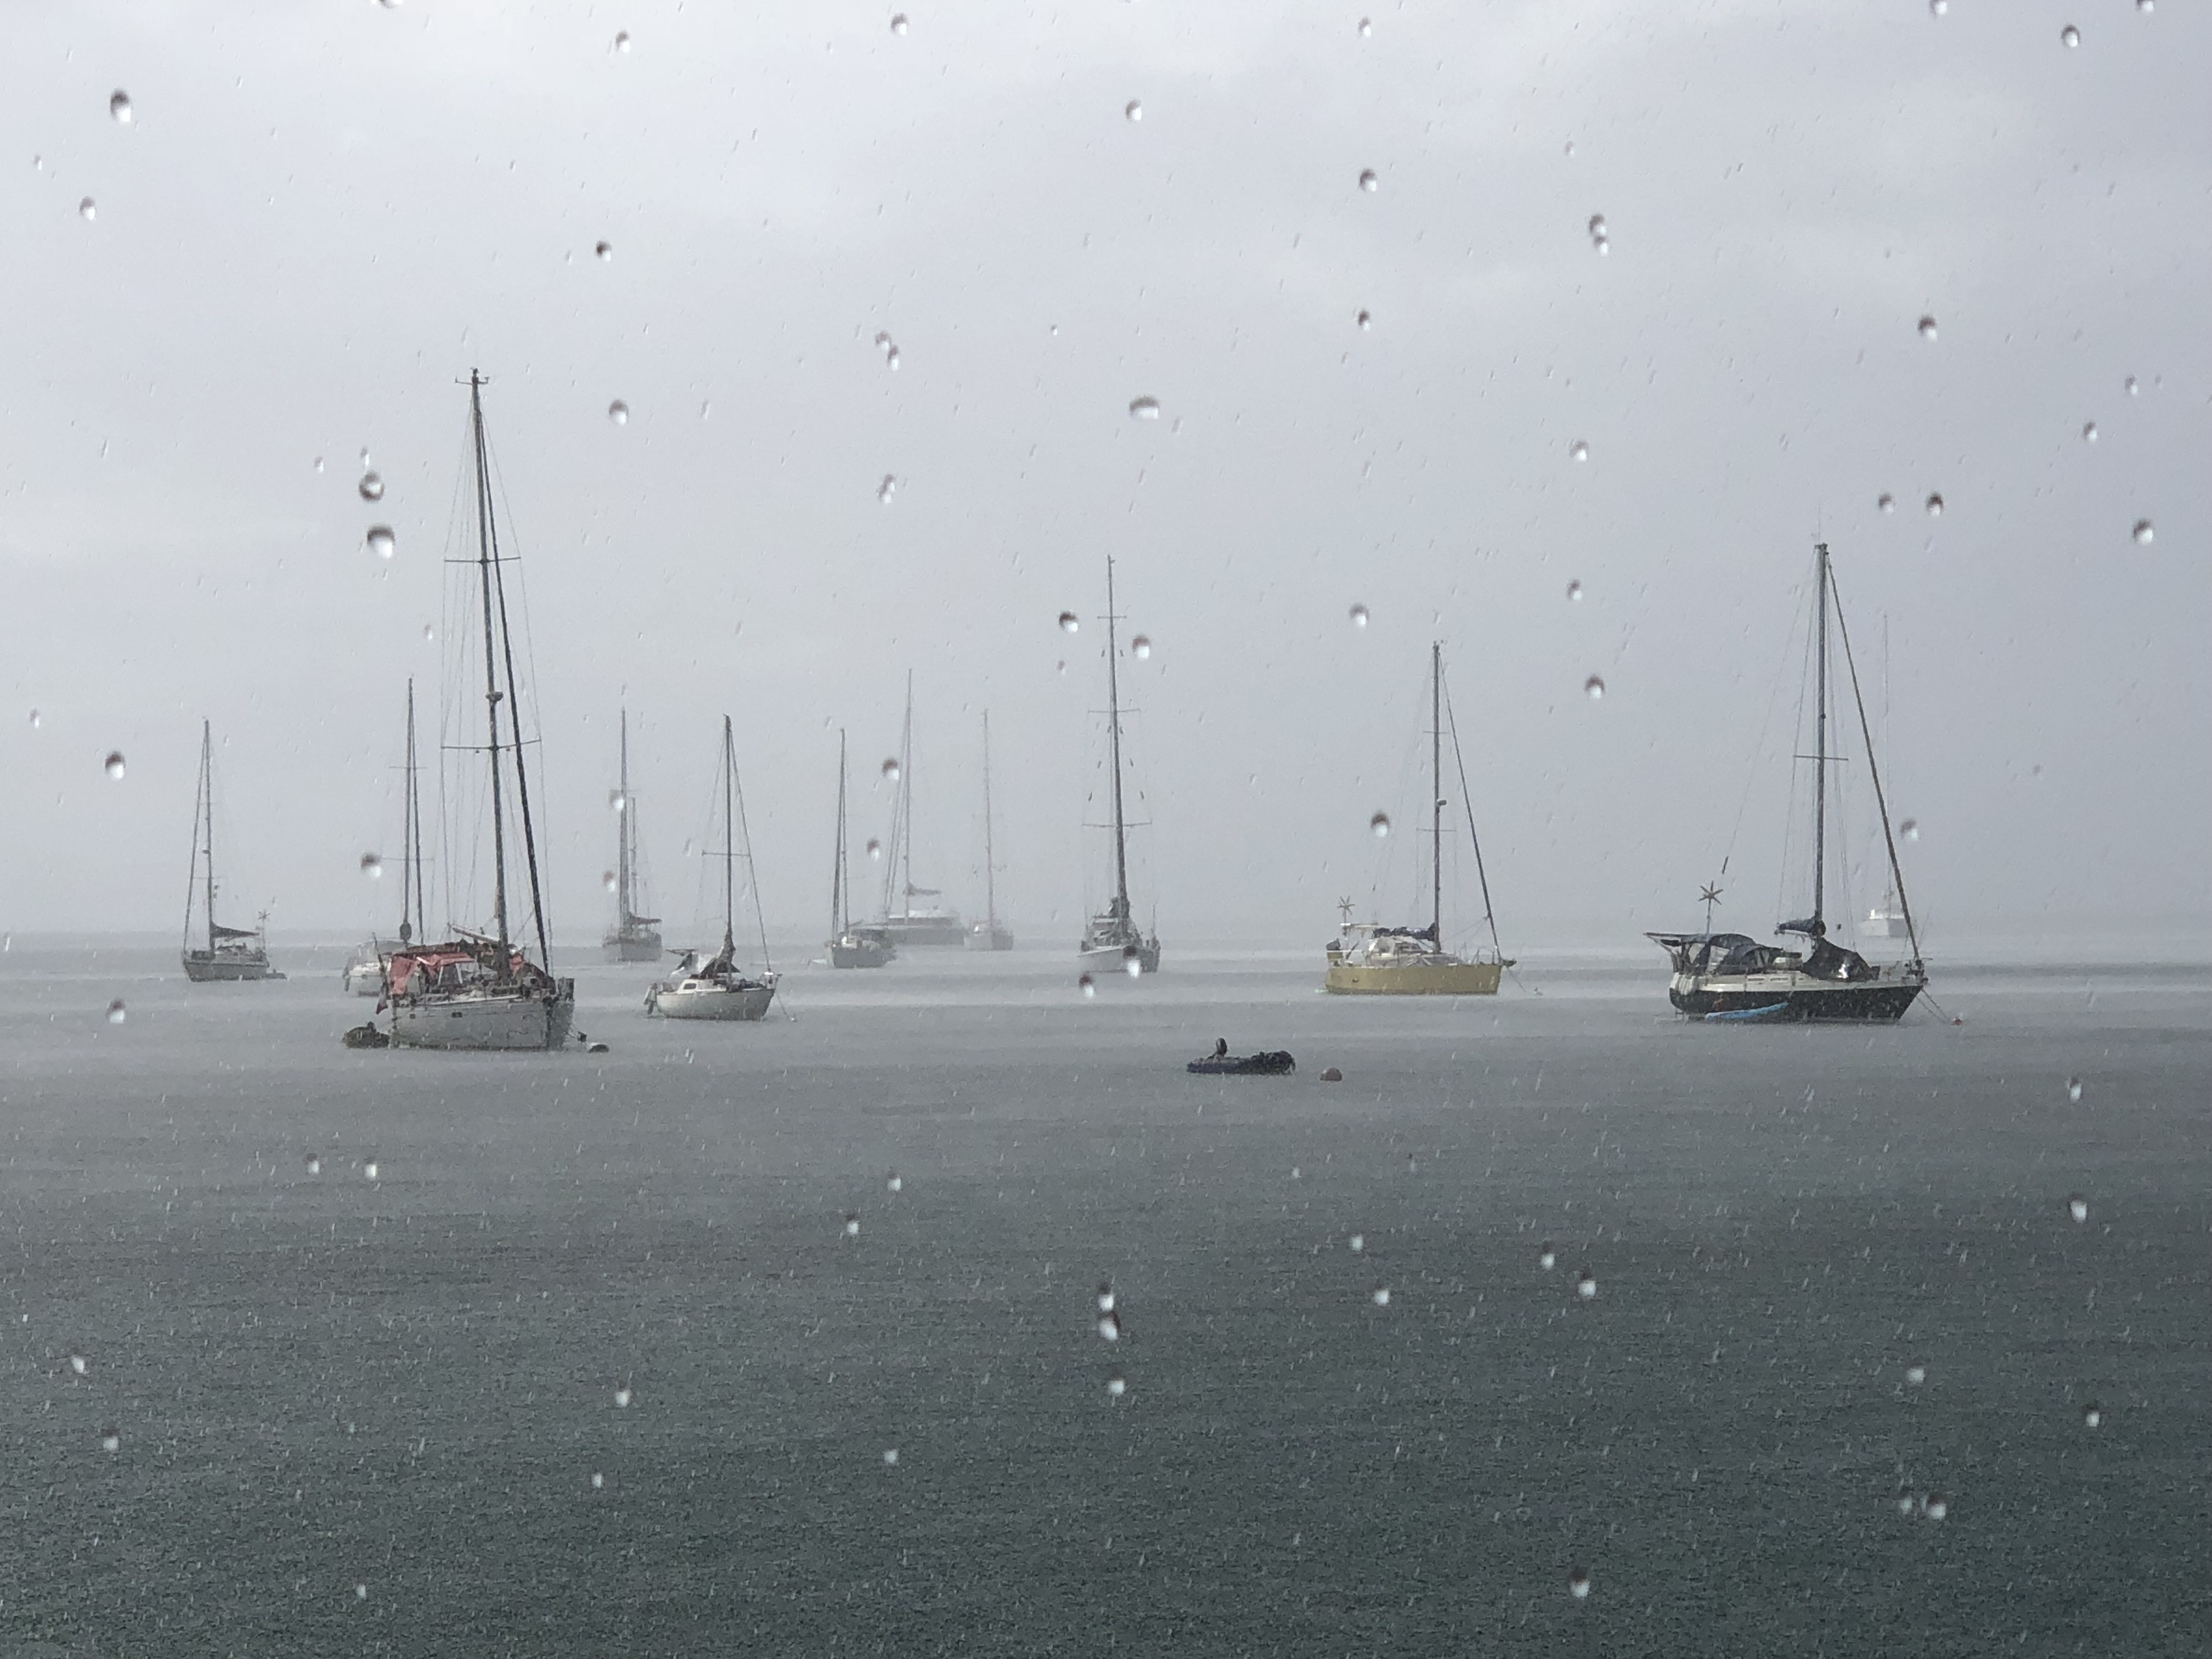 Rain in the Anchorage - Deshaies